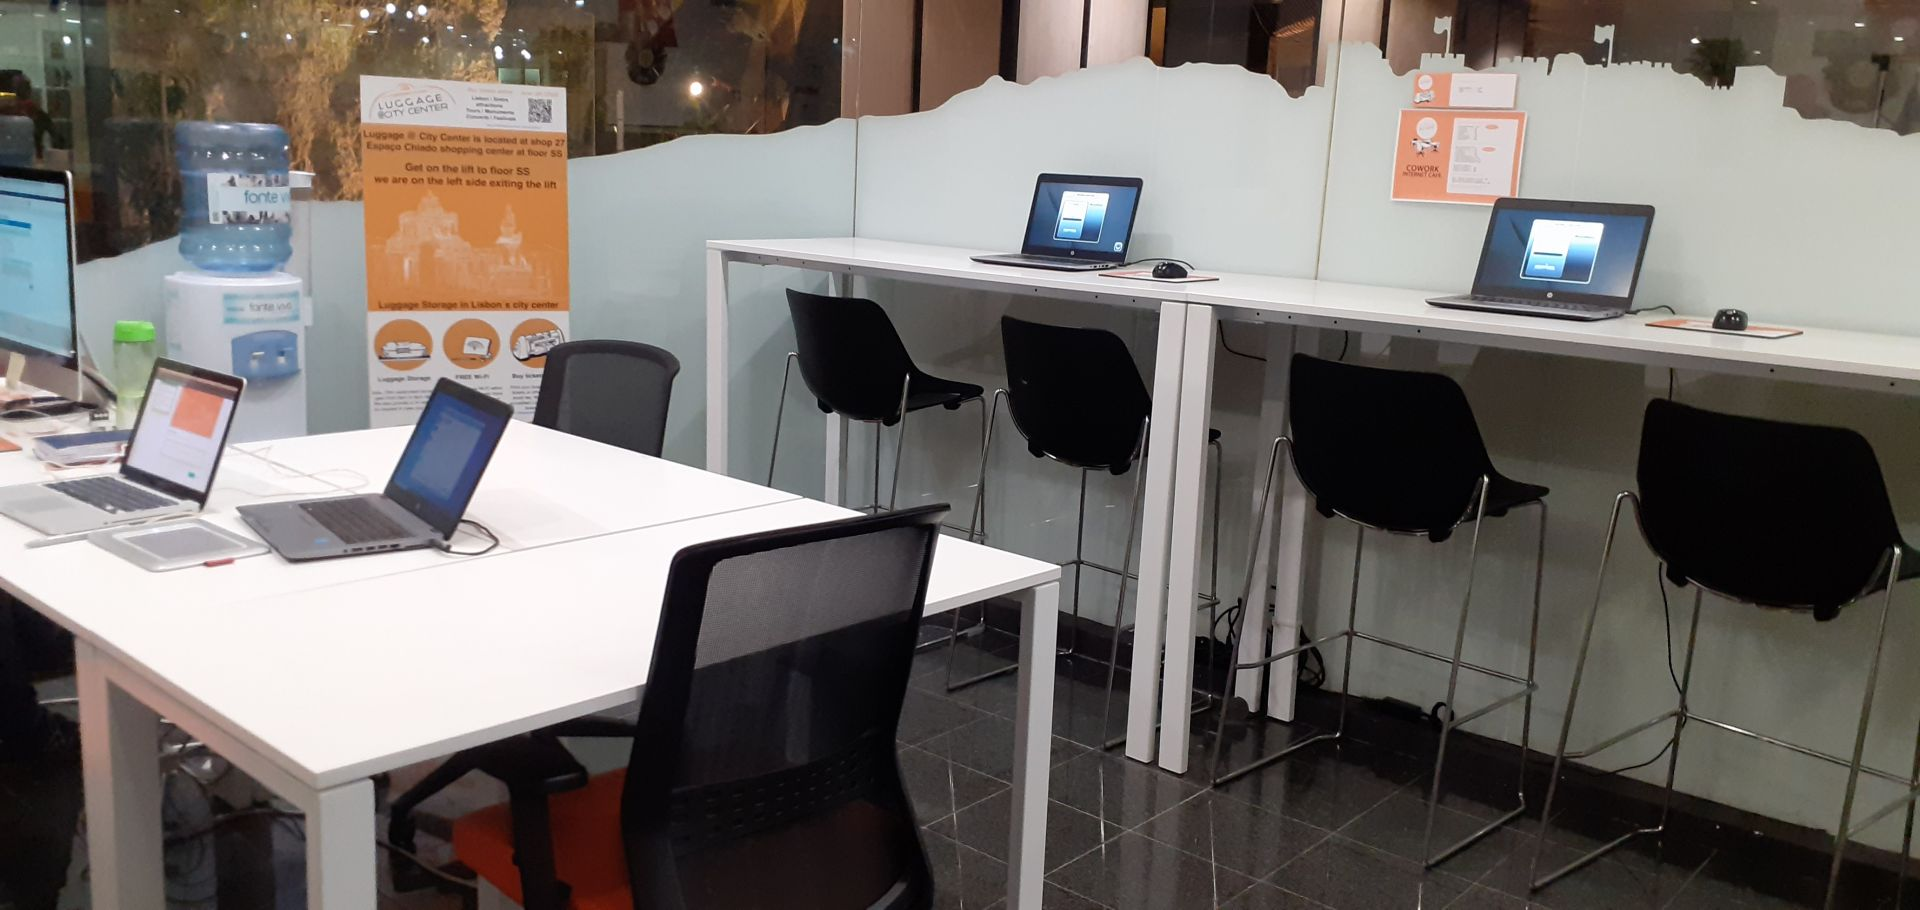 Luggage at City Center Cowork & Internet Lounge, Lisbon